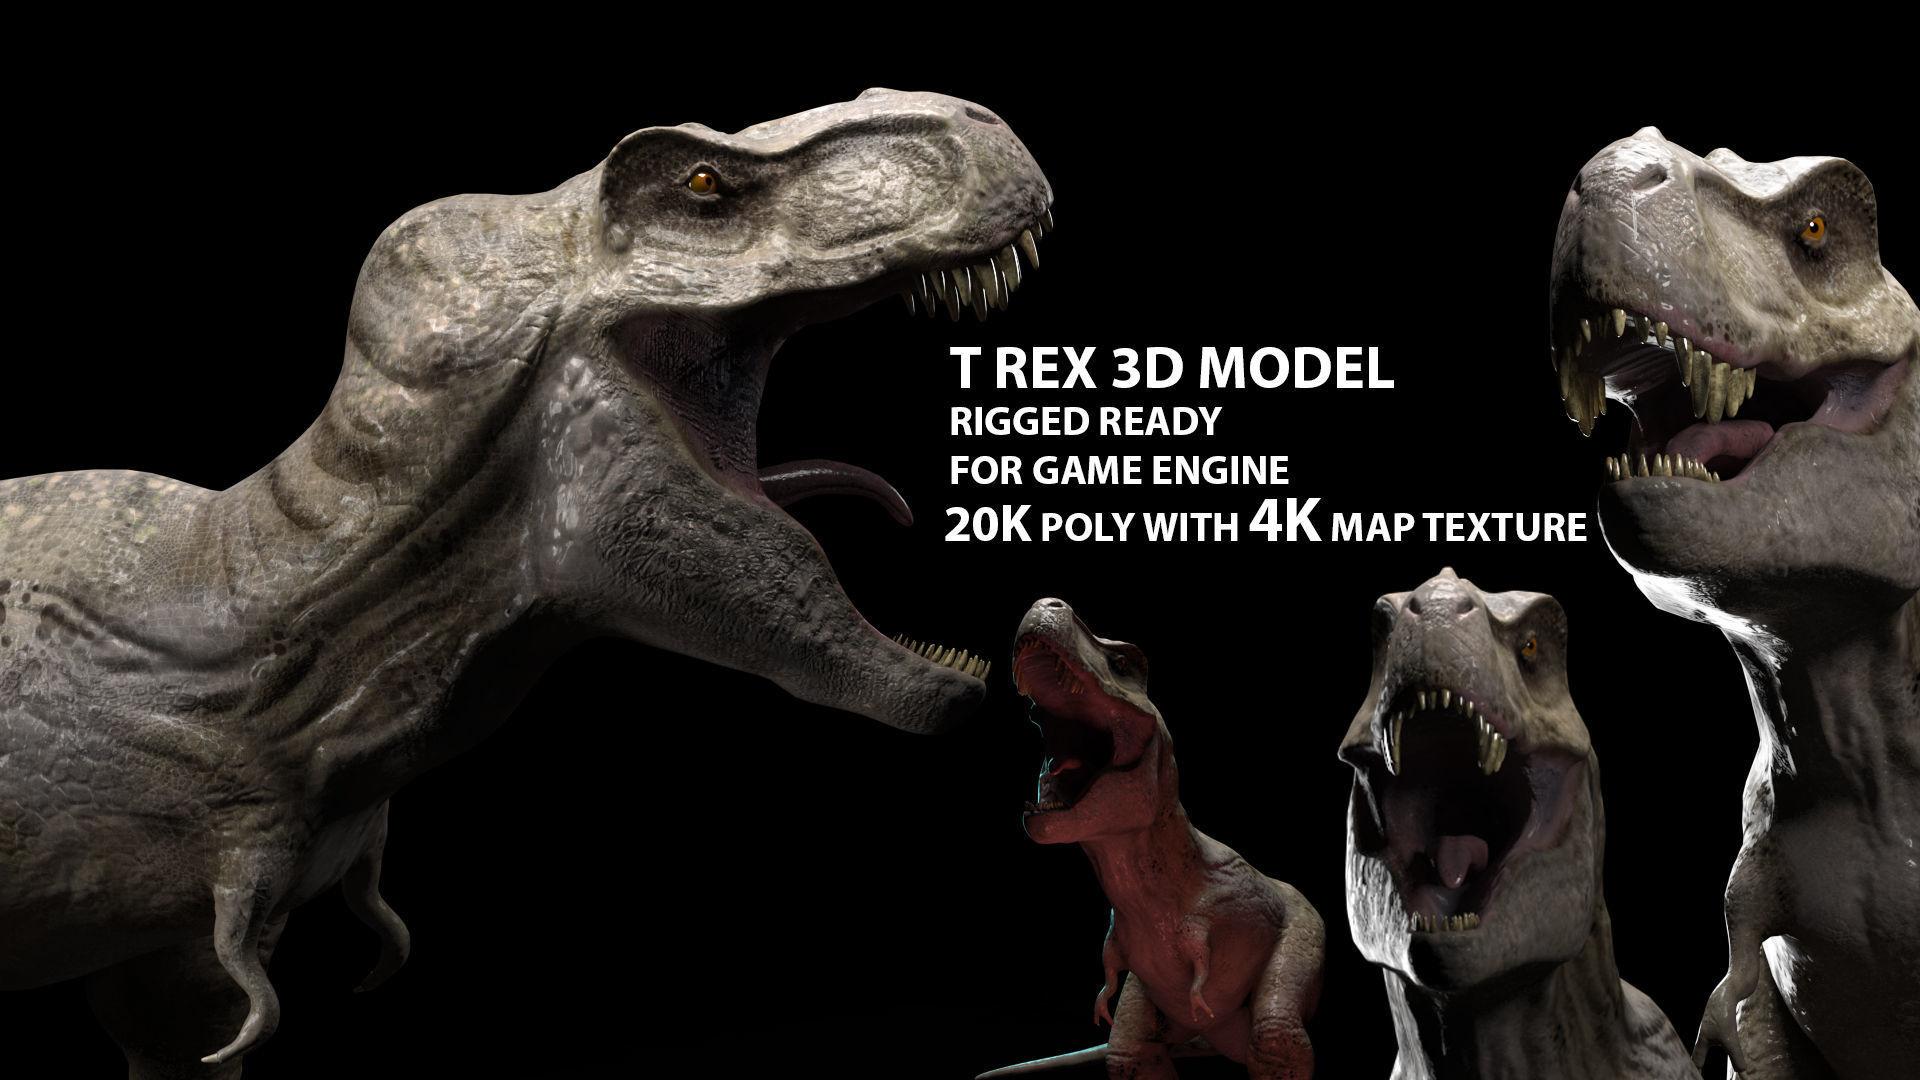 Trex dinosaur game model Tyrannosaurus